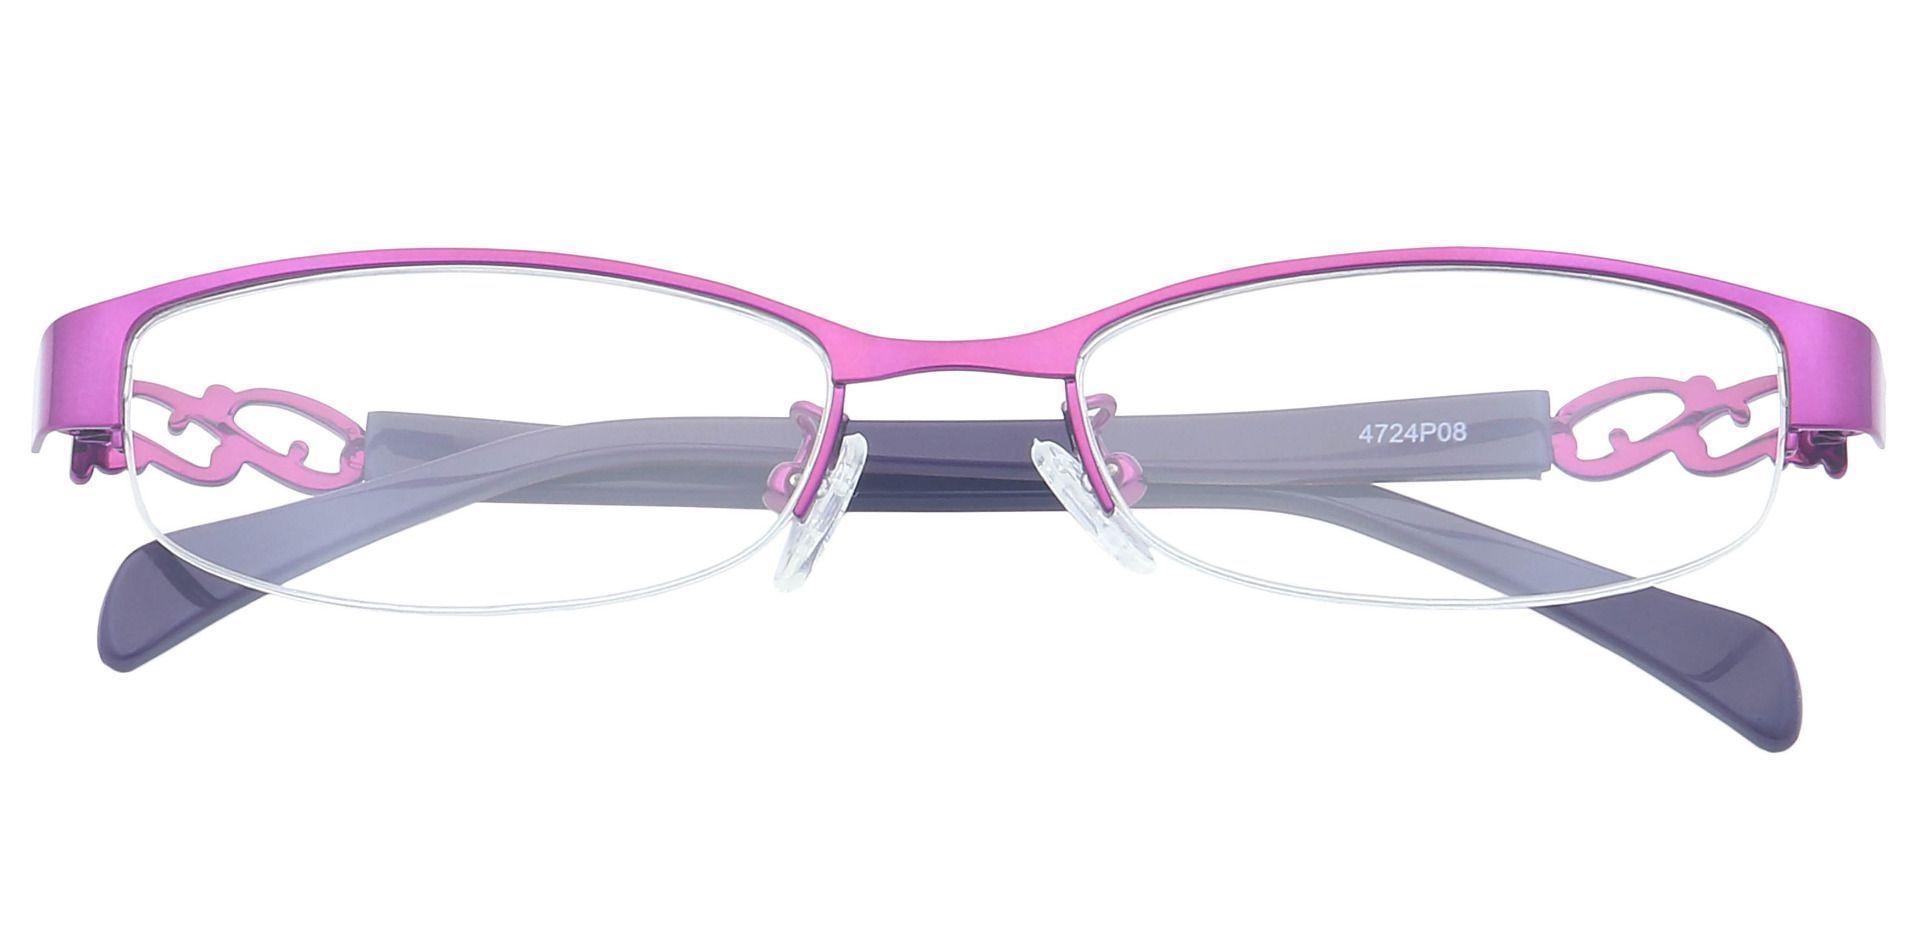 Danae Oval Single Vision Glasses - Purple